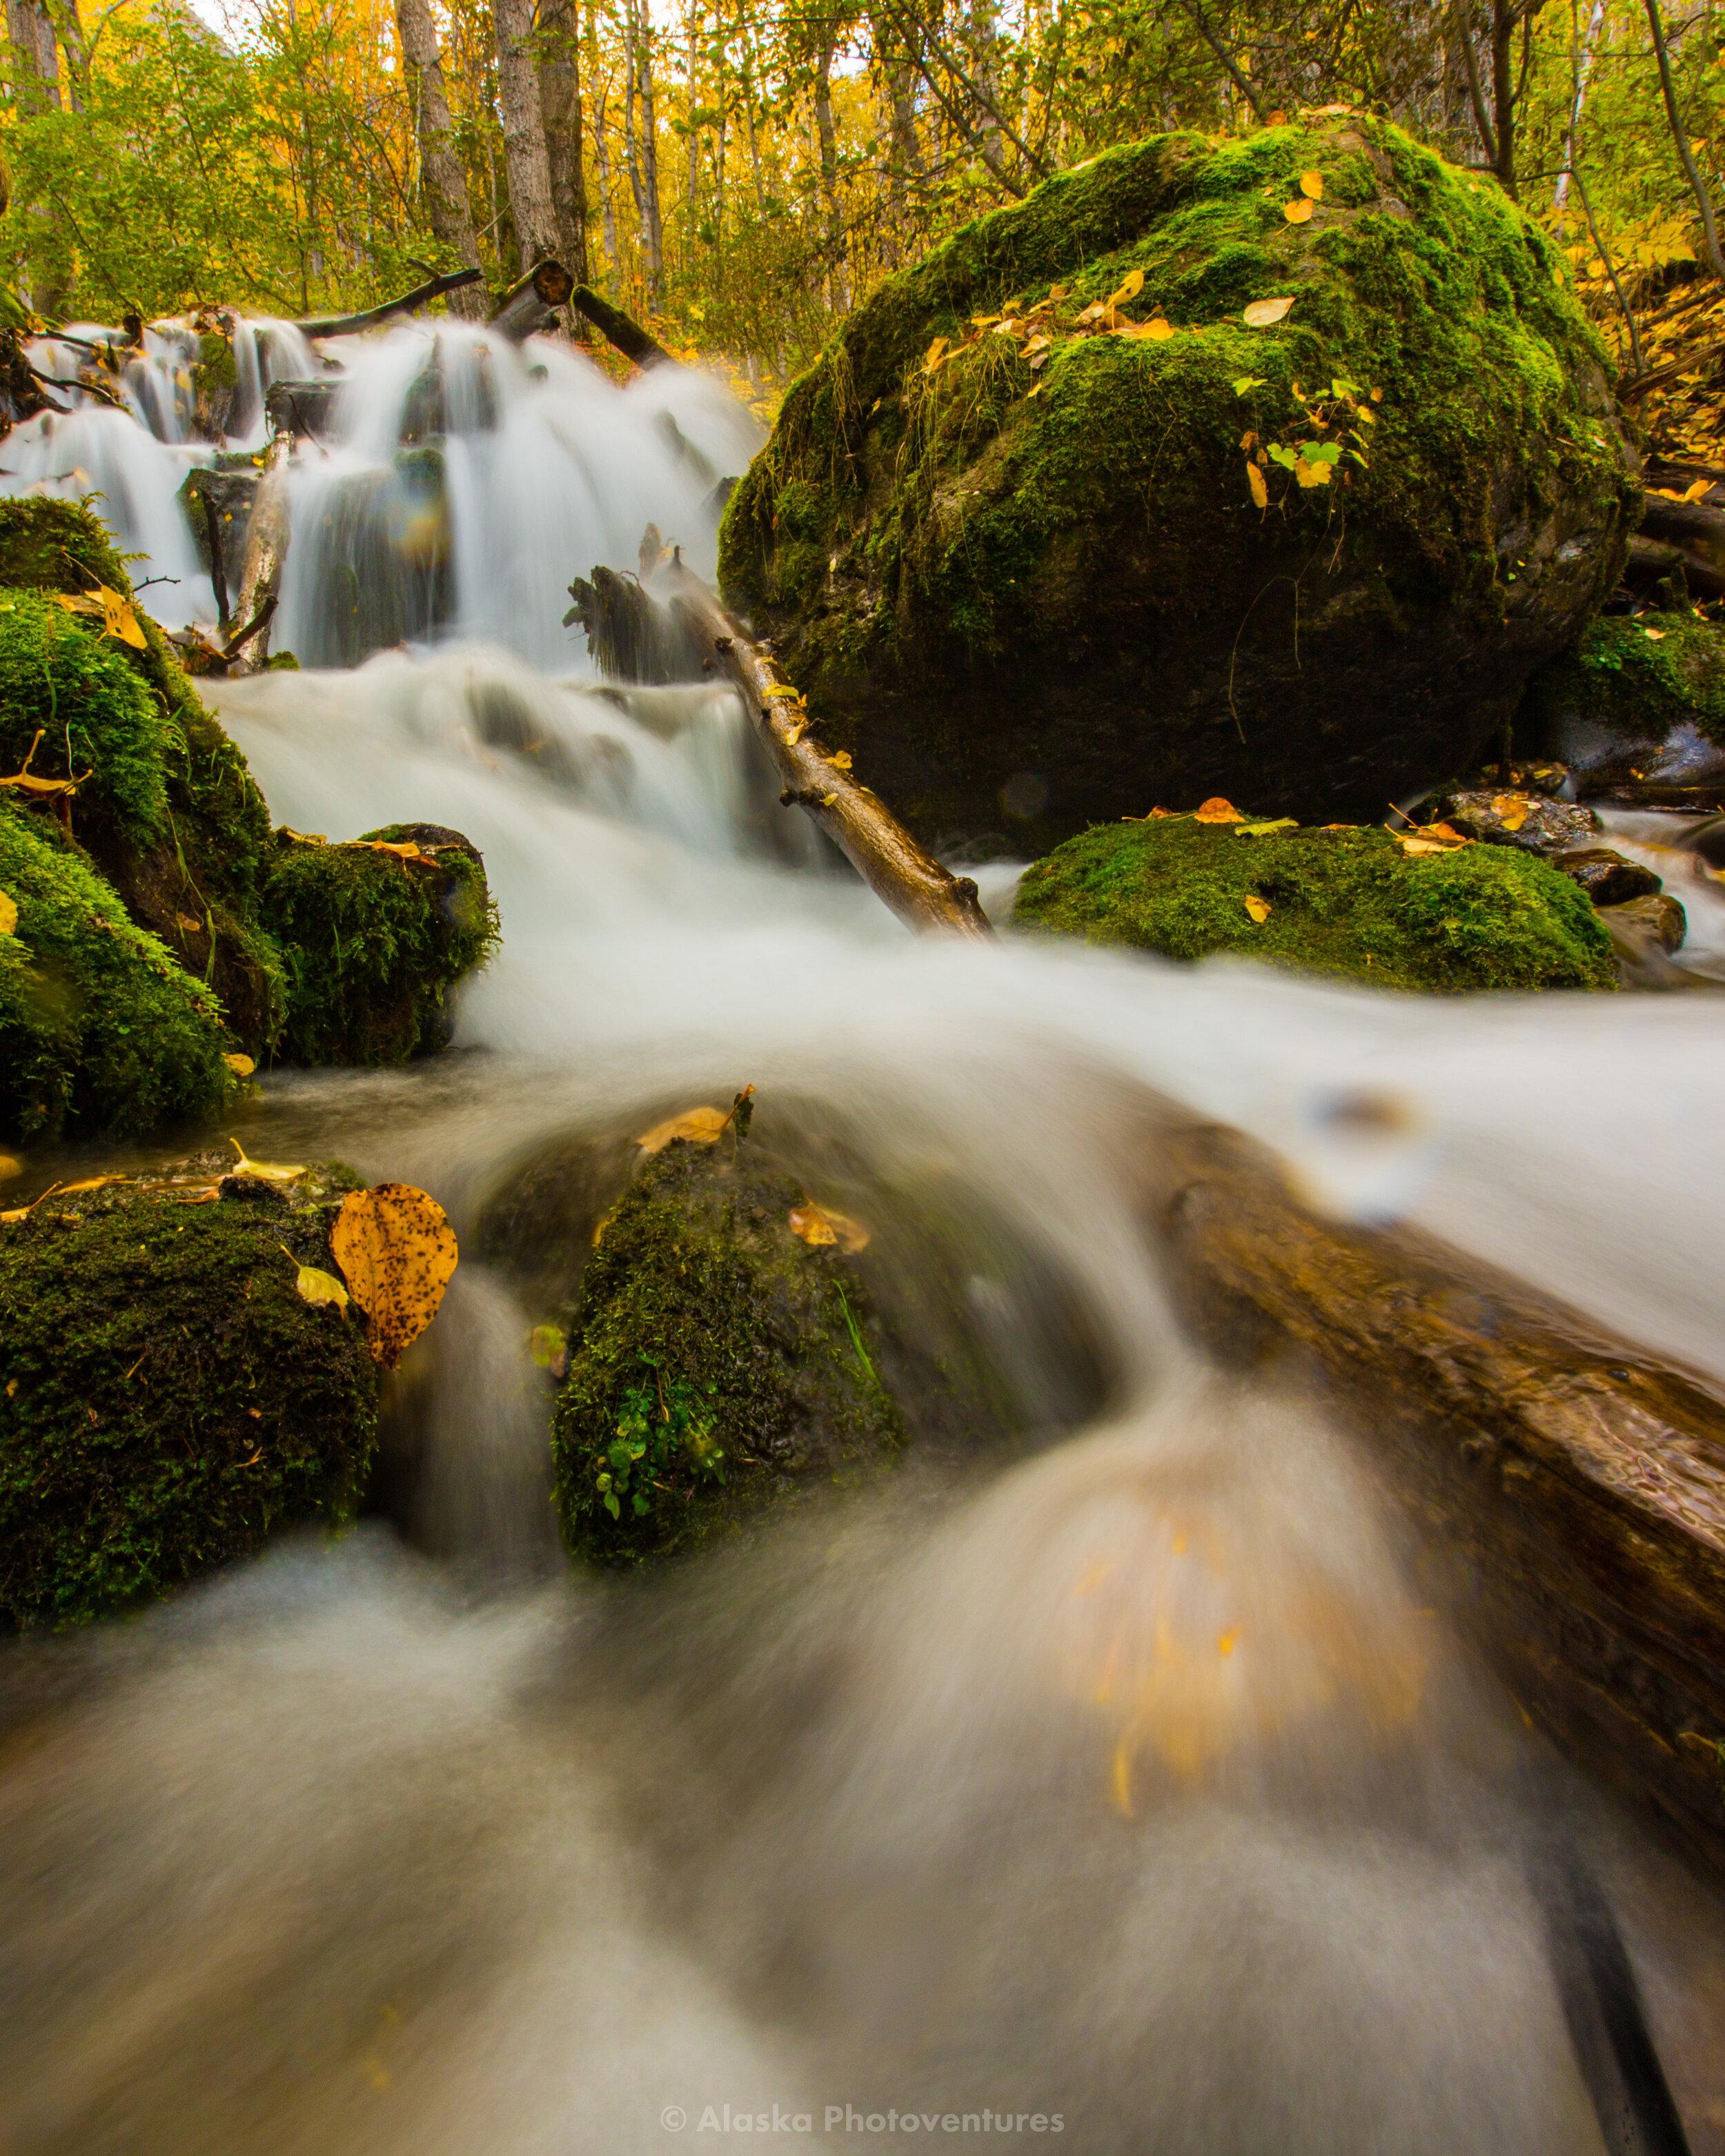 alaska-photoventures-waterfall-photography-falls-creek.jpg